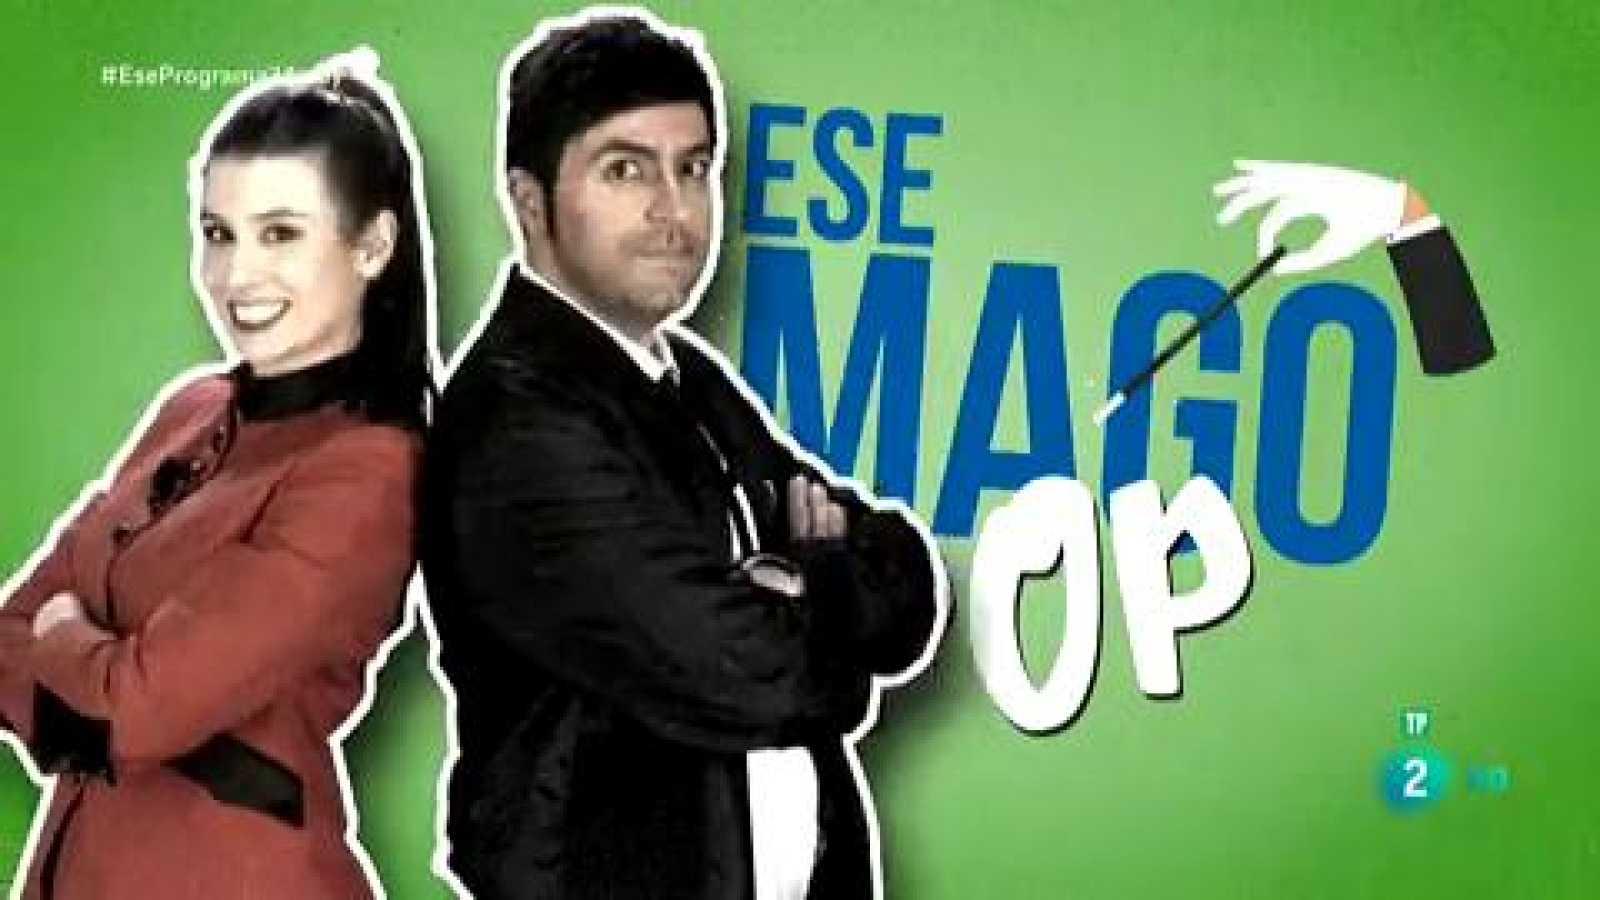 Ese programa - Ese Mago Pop